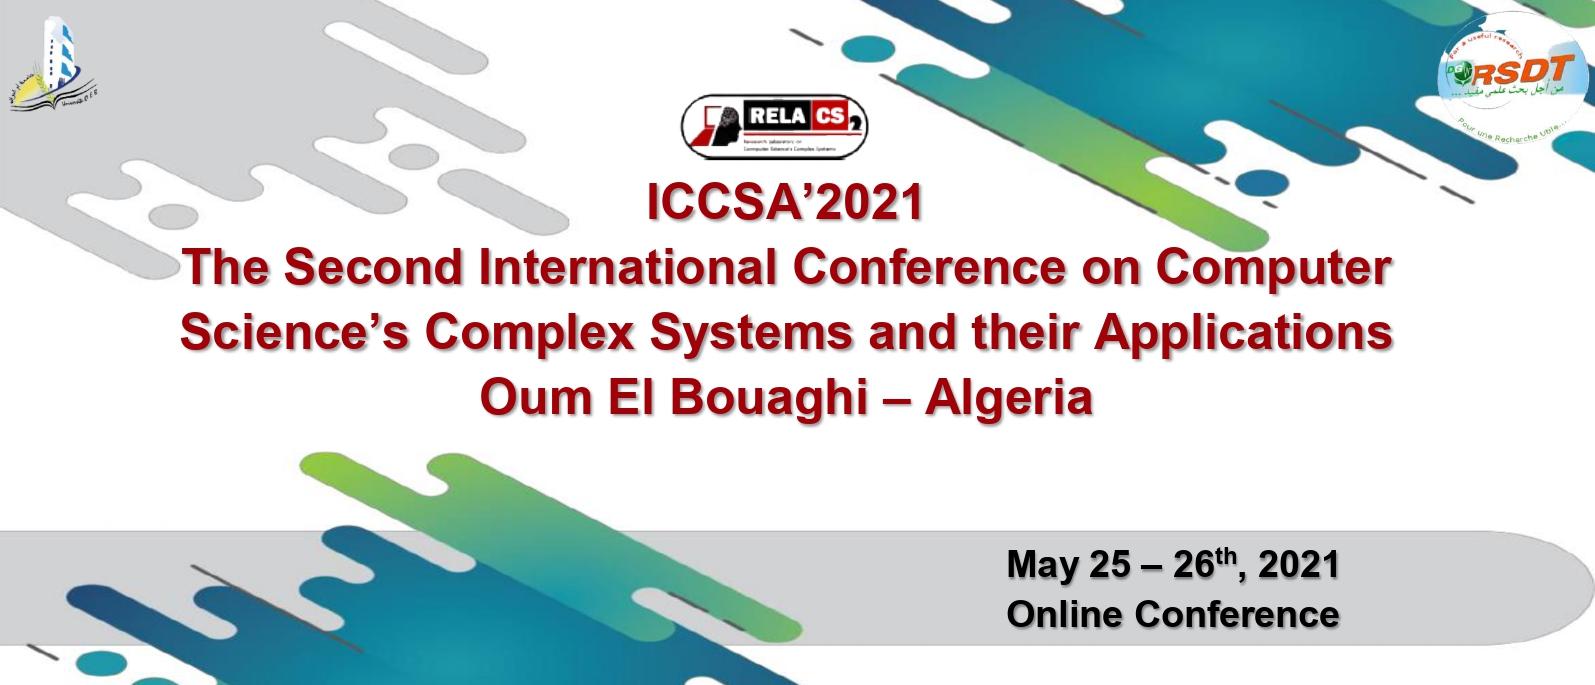 ICCSA'2021